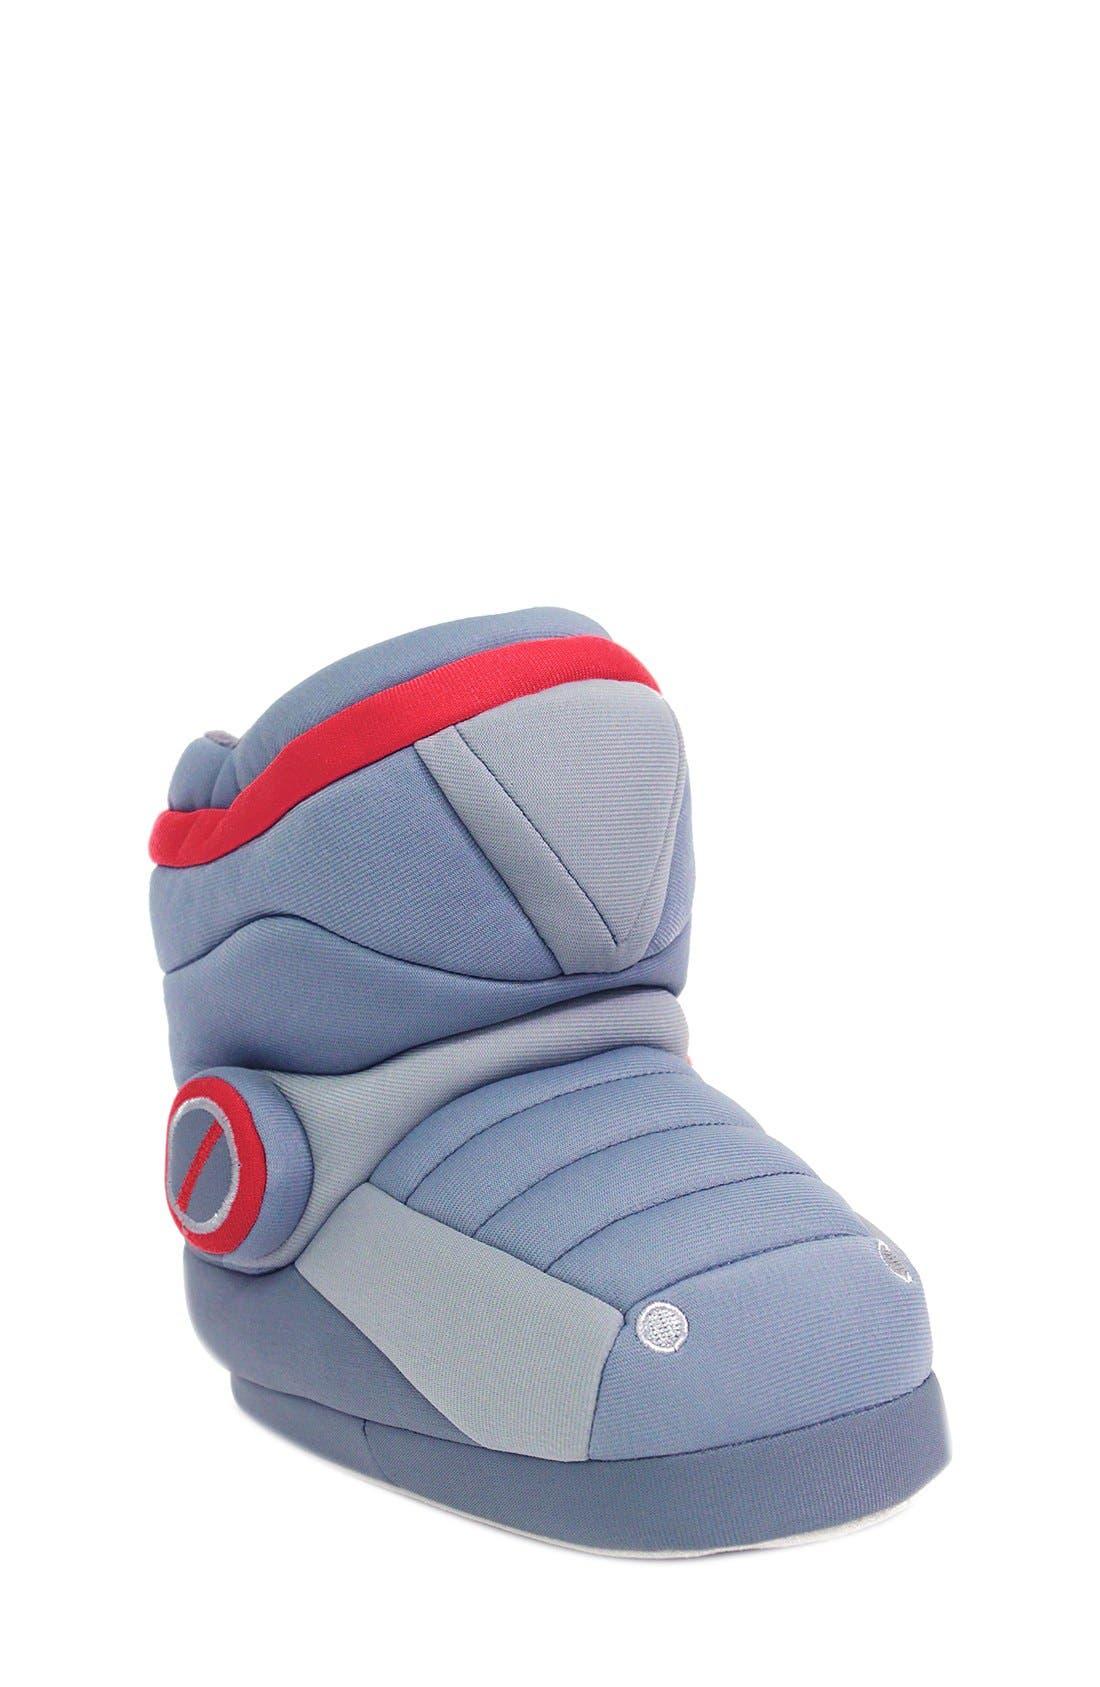 Robot Slipper Boot,                             Main thumbnail 1, color,                             020